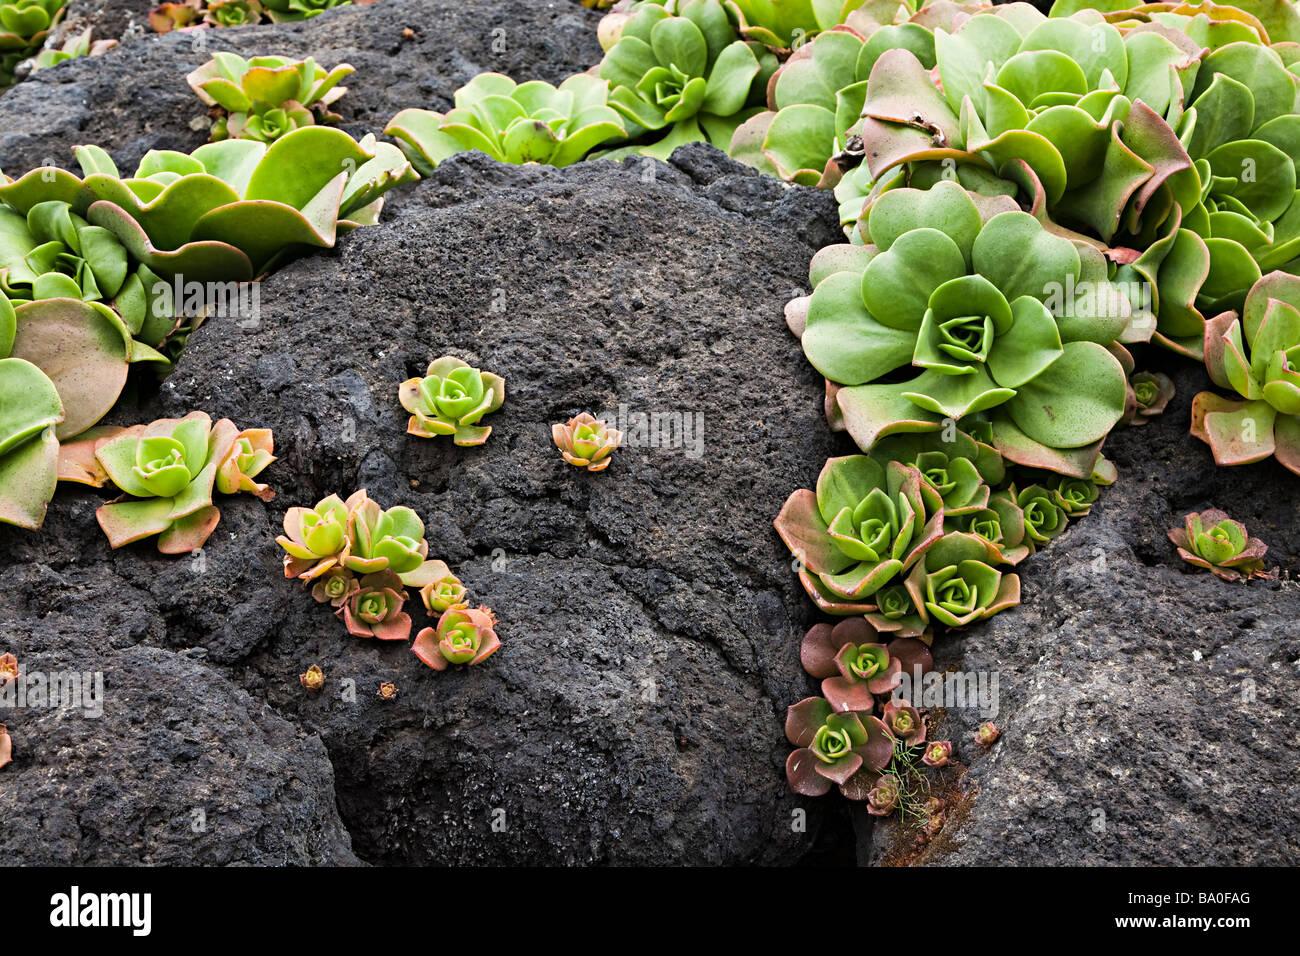 Aeonium canariense succulenta nativo di Tenerife Canarie Spagna Immagini Stock